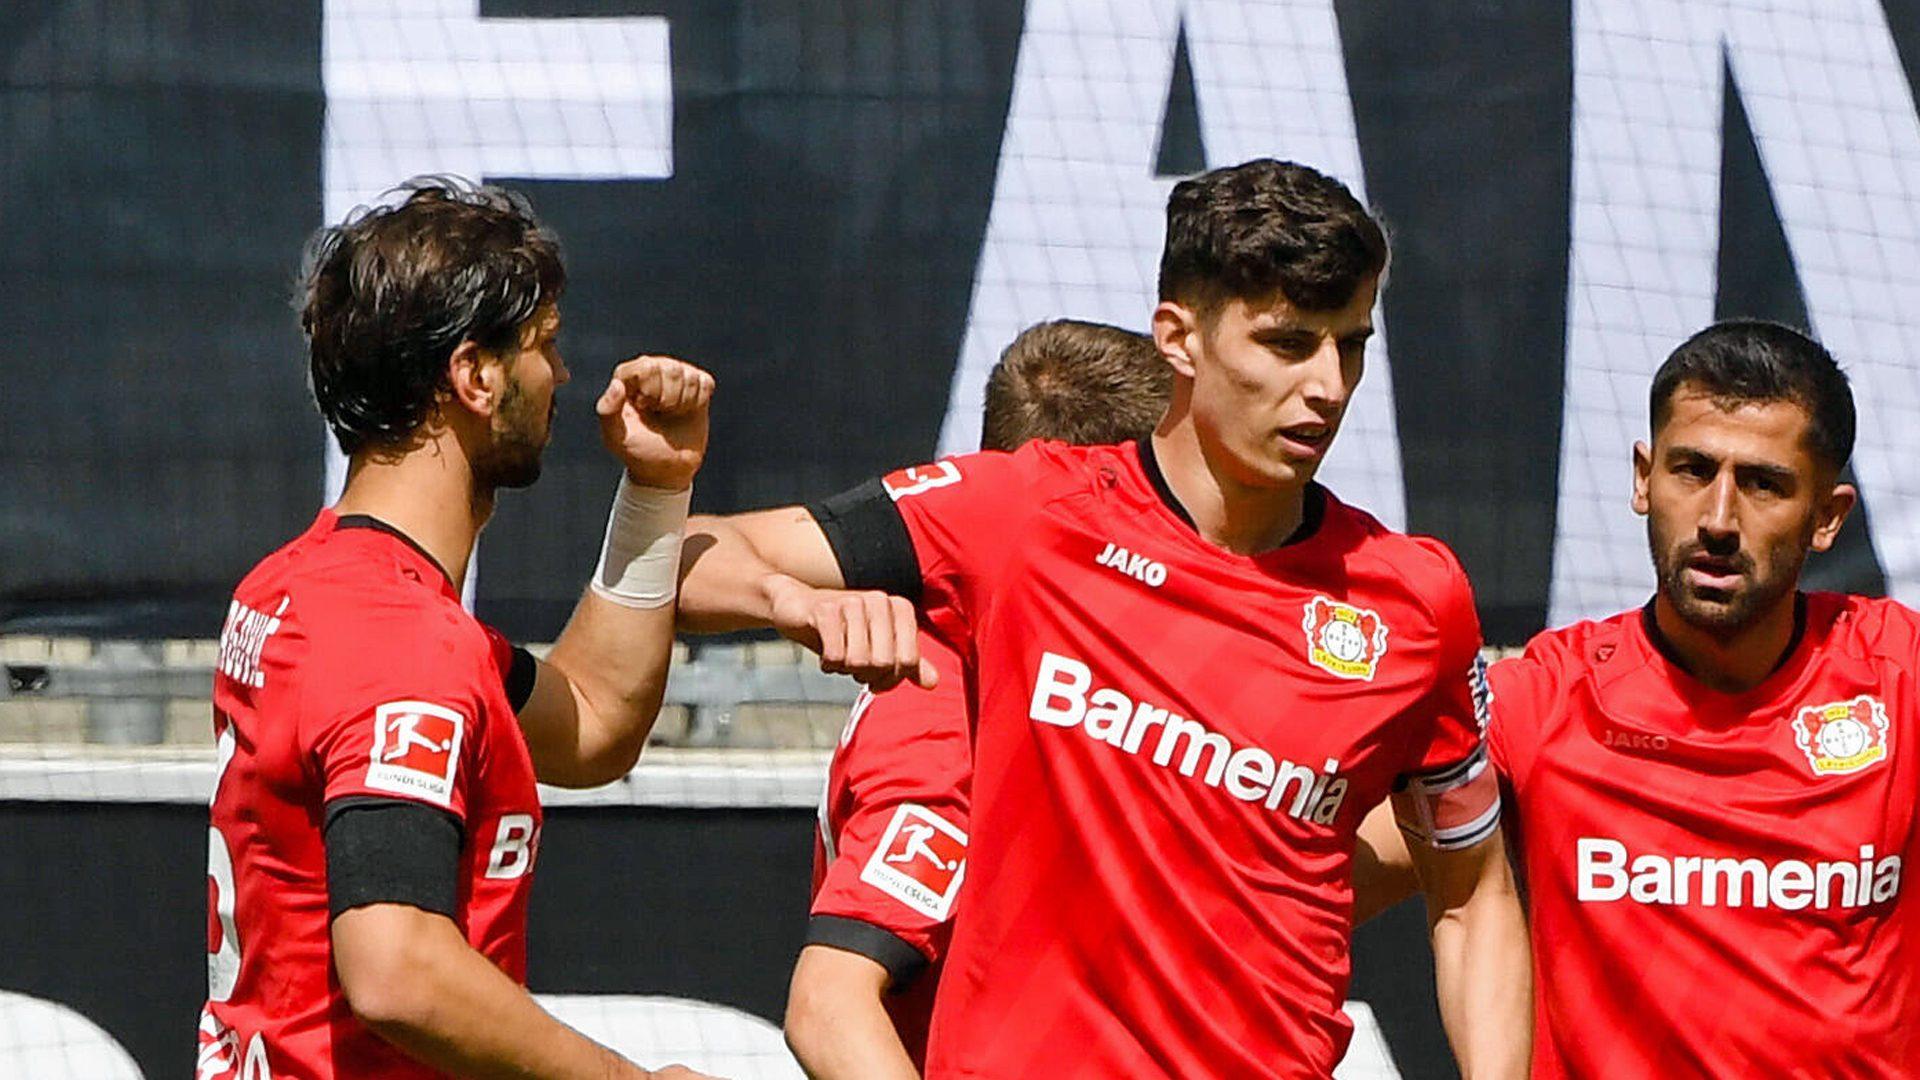 Havertz brace as Leverkusen beat Gladbach